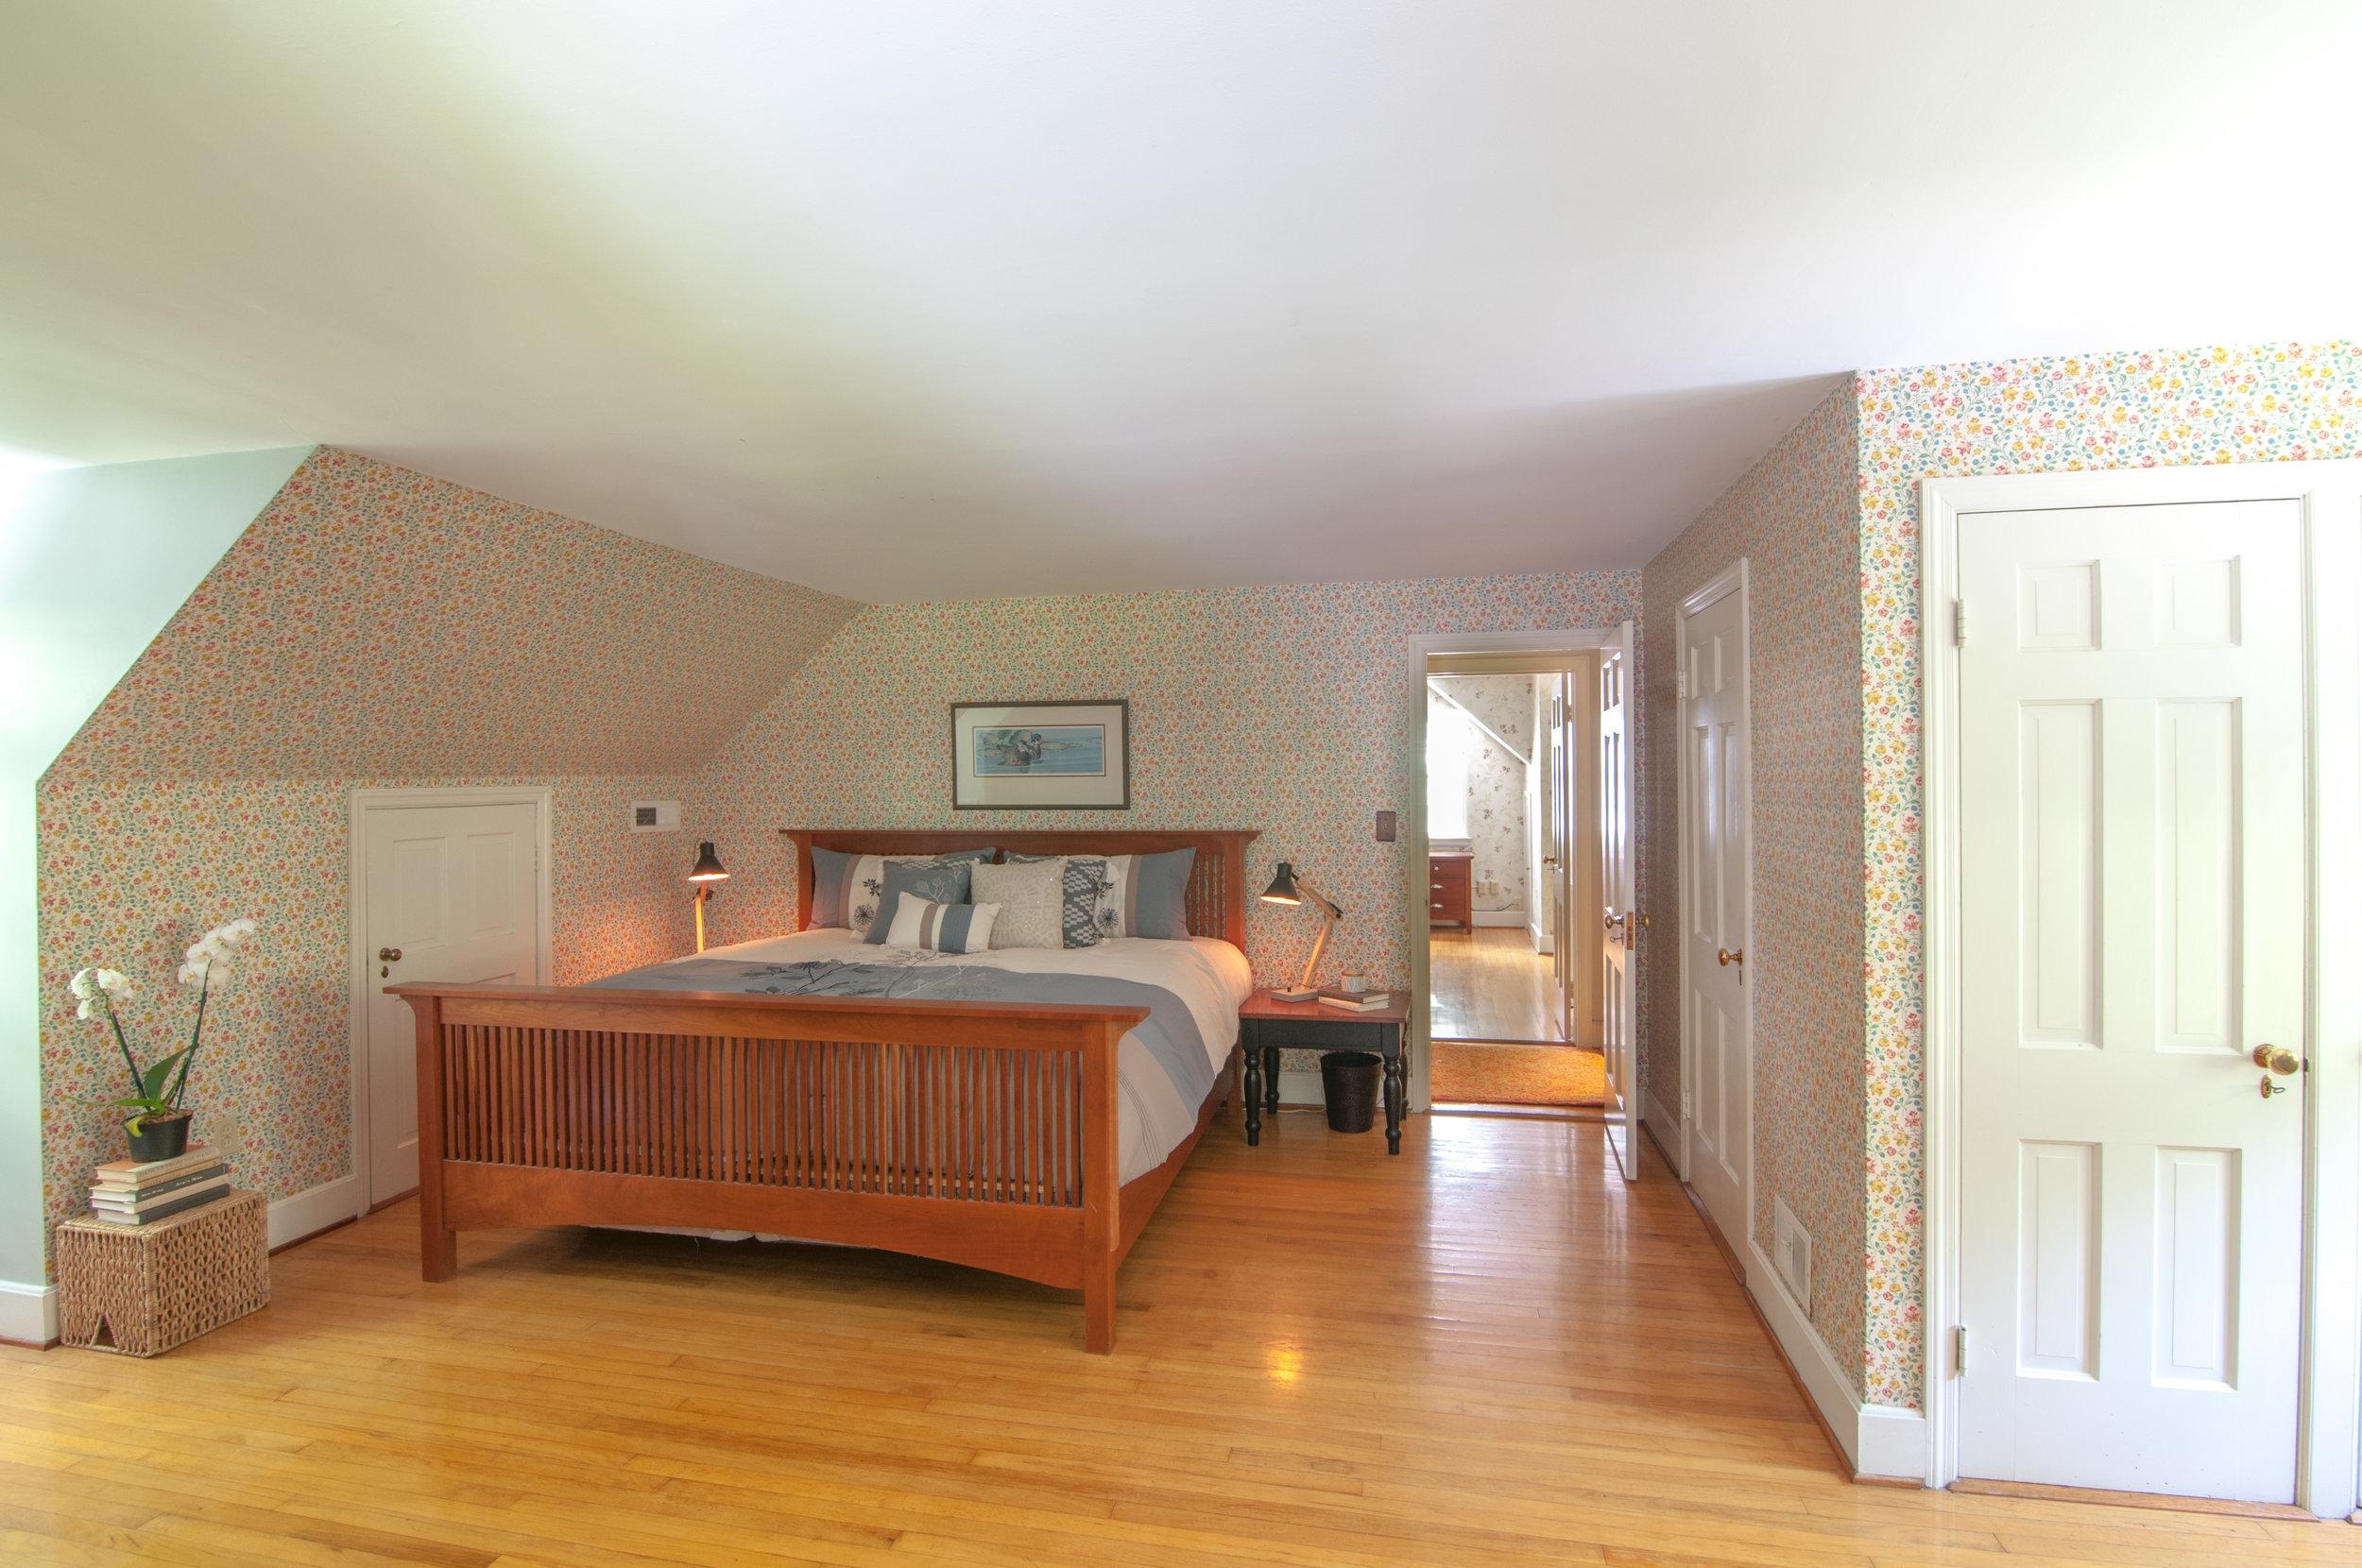 40-WHurleyRd-Master-Bedroom.jpg